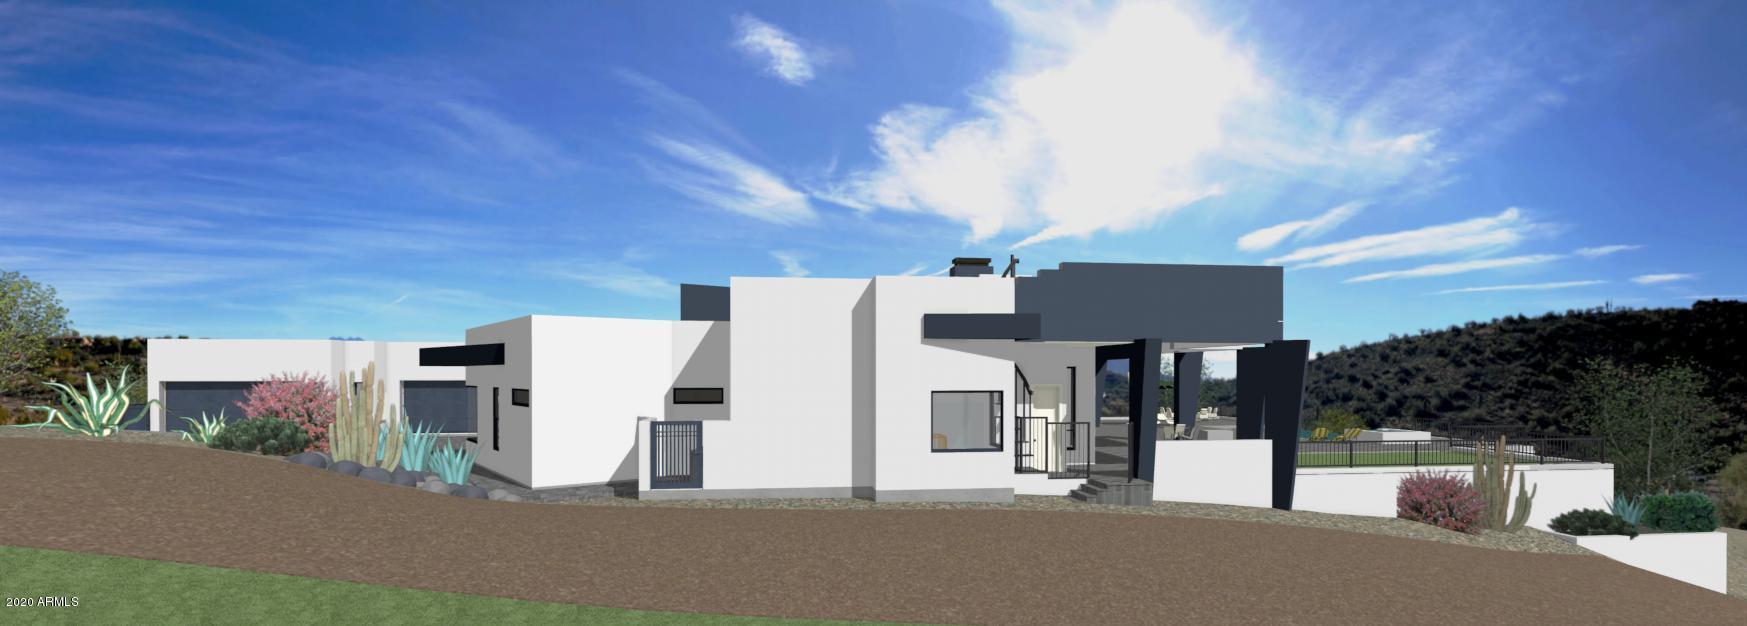 MLS 6132467 15651 E PALATIAL Drive, Fountain Hills, AZ 85268 Fountain Hills AZ Newly Built